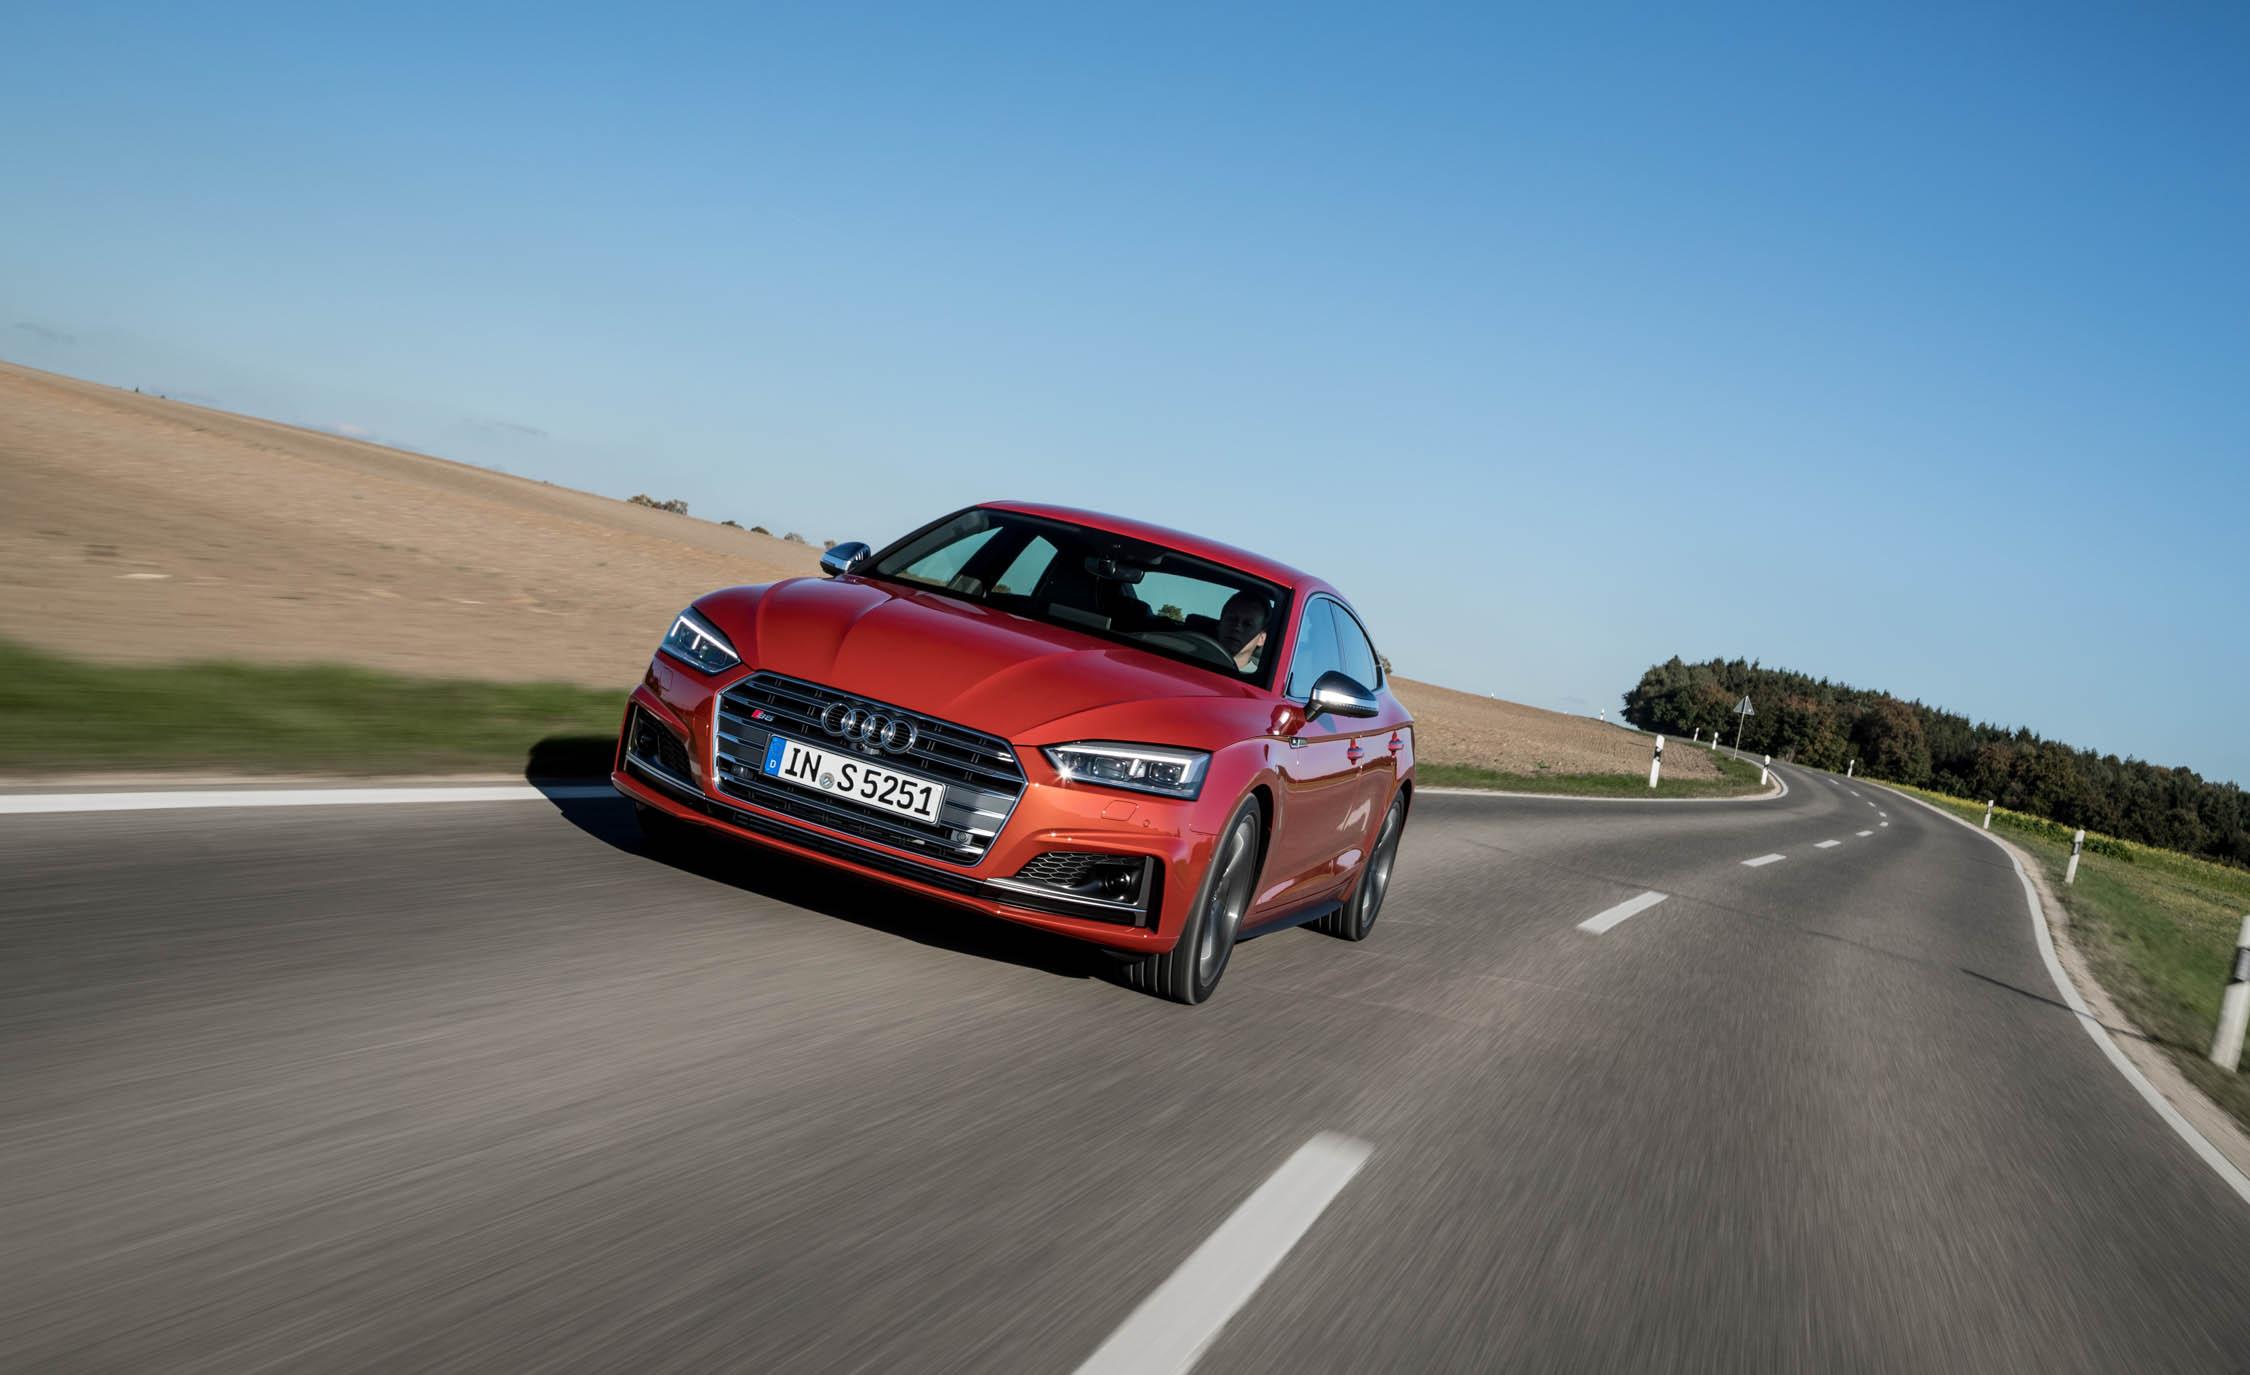 2017 Audi S5 Sportback (View 4 of 10)